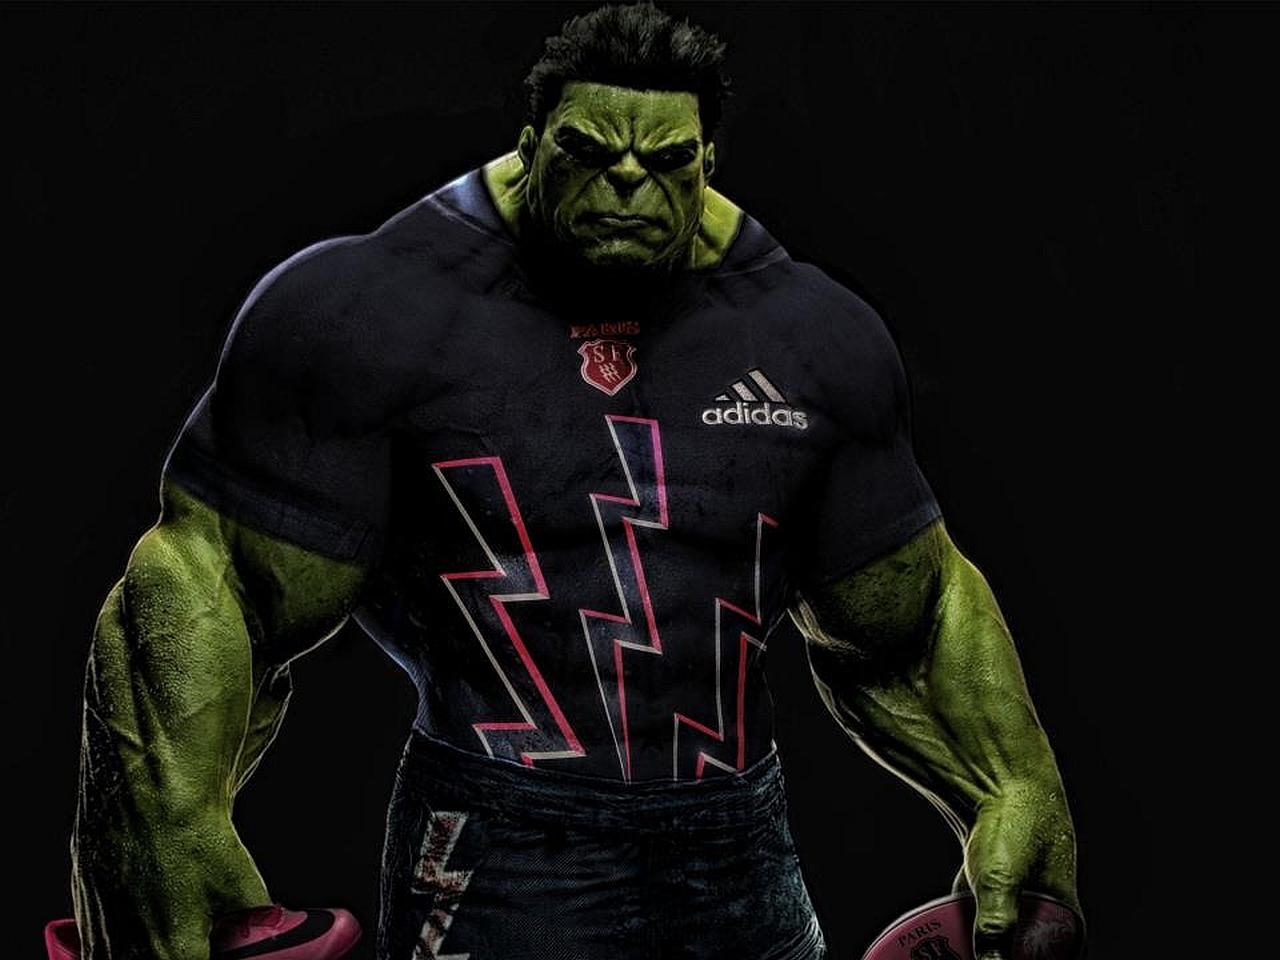 Wallpaper Superhero Marvel 3d Hd Wallpapers Of Hulk Impremedia Net